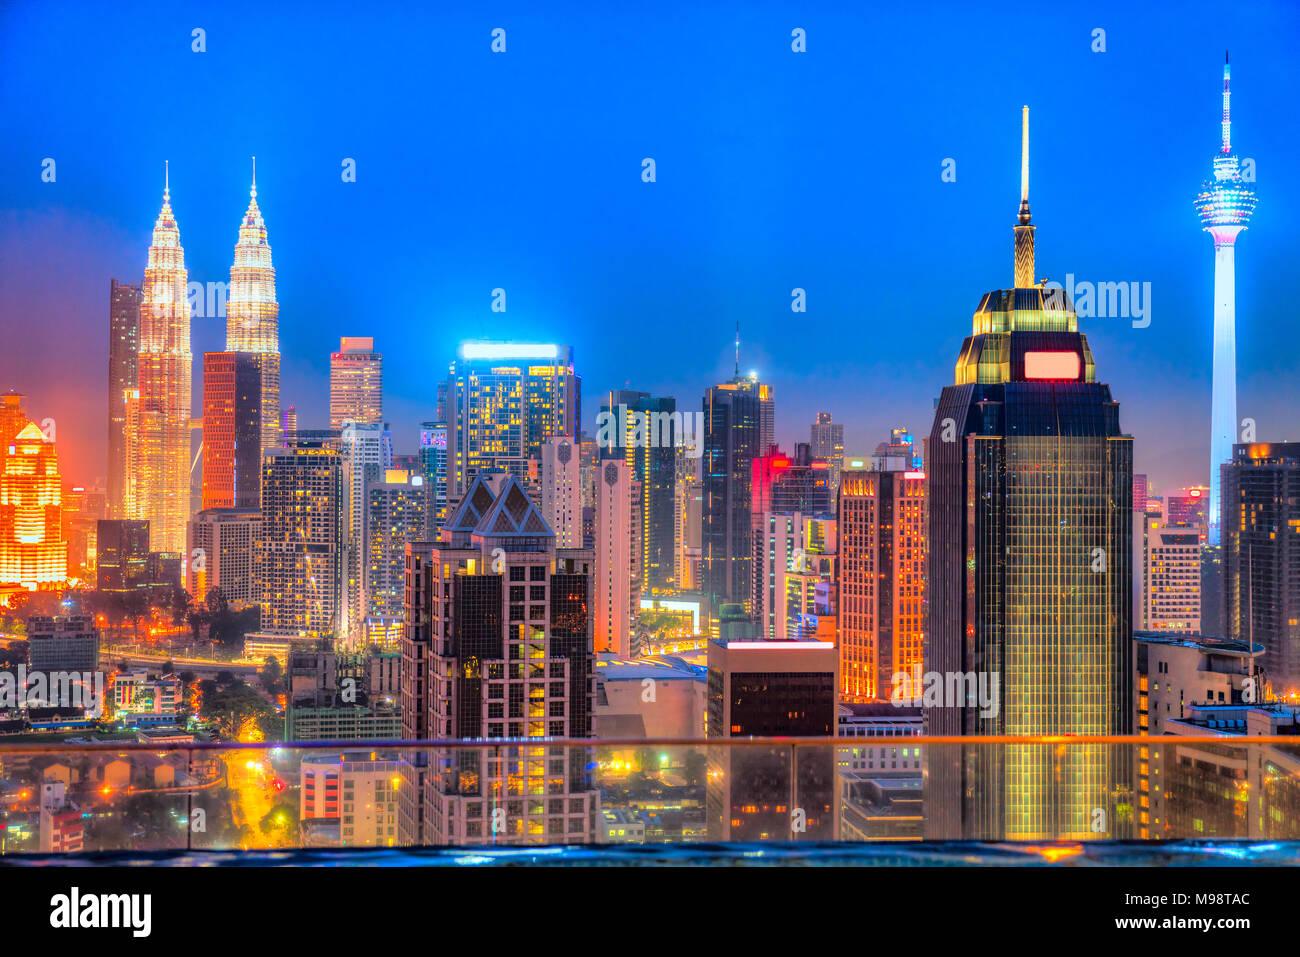 Kuala Lumpur, Malesia. Lo skyline di notte Immagini Stock